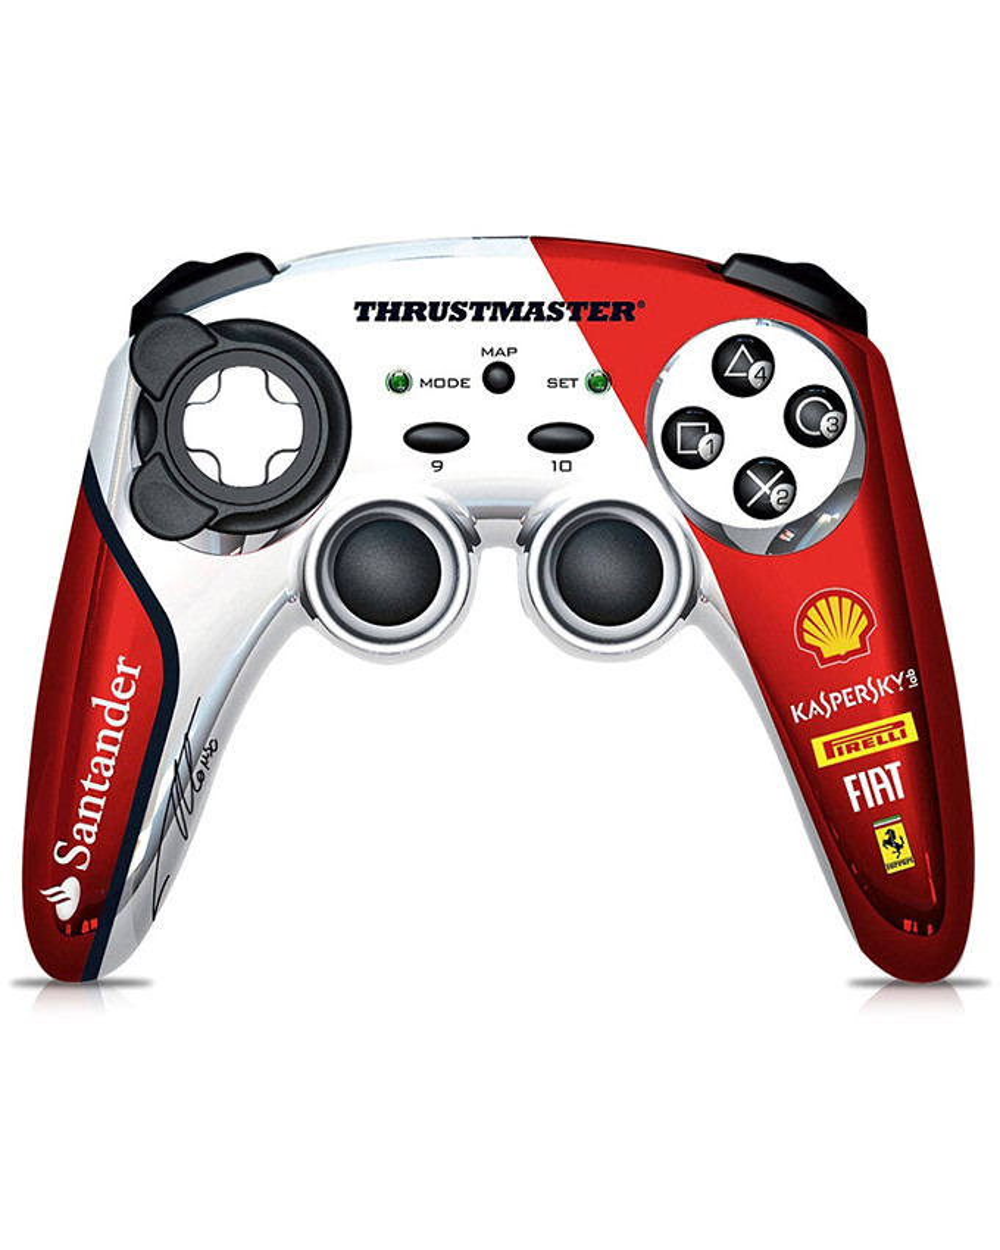 Gamepad Thrustmaster F1 Wireless Gamepad F150 Italia - Alonso LE PCG / PS3